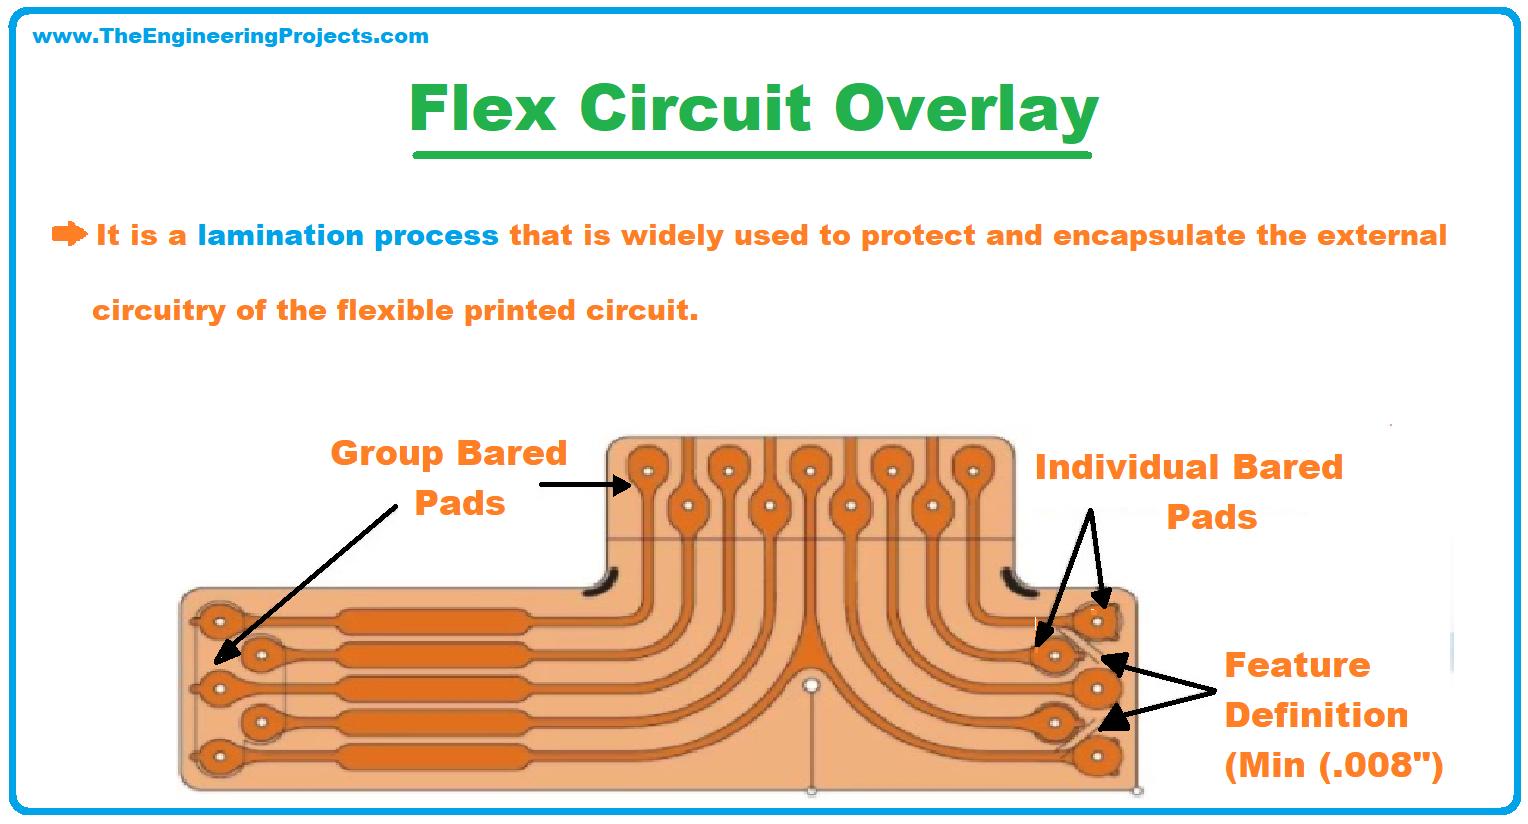 flexible pcb, flex pcb, introduction to flexible pcb, intro to flexible pcb, what is flexible pcb, what is flex pcb, applications of flexible pcb, fabrication of flexible pcb, Flexible PCB Manufacturing Process, flex circuit overlay